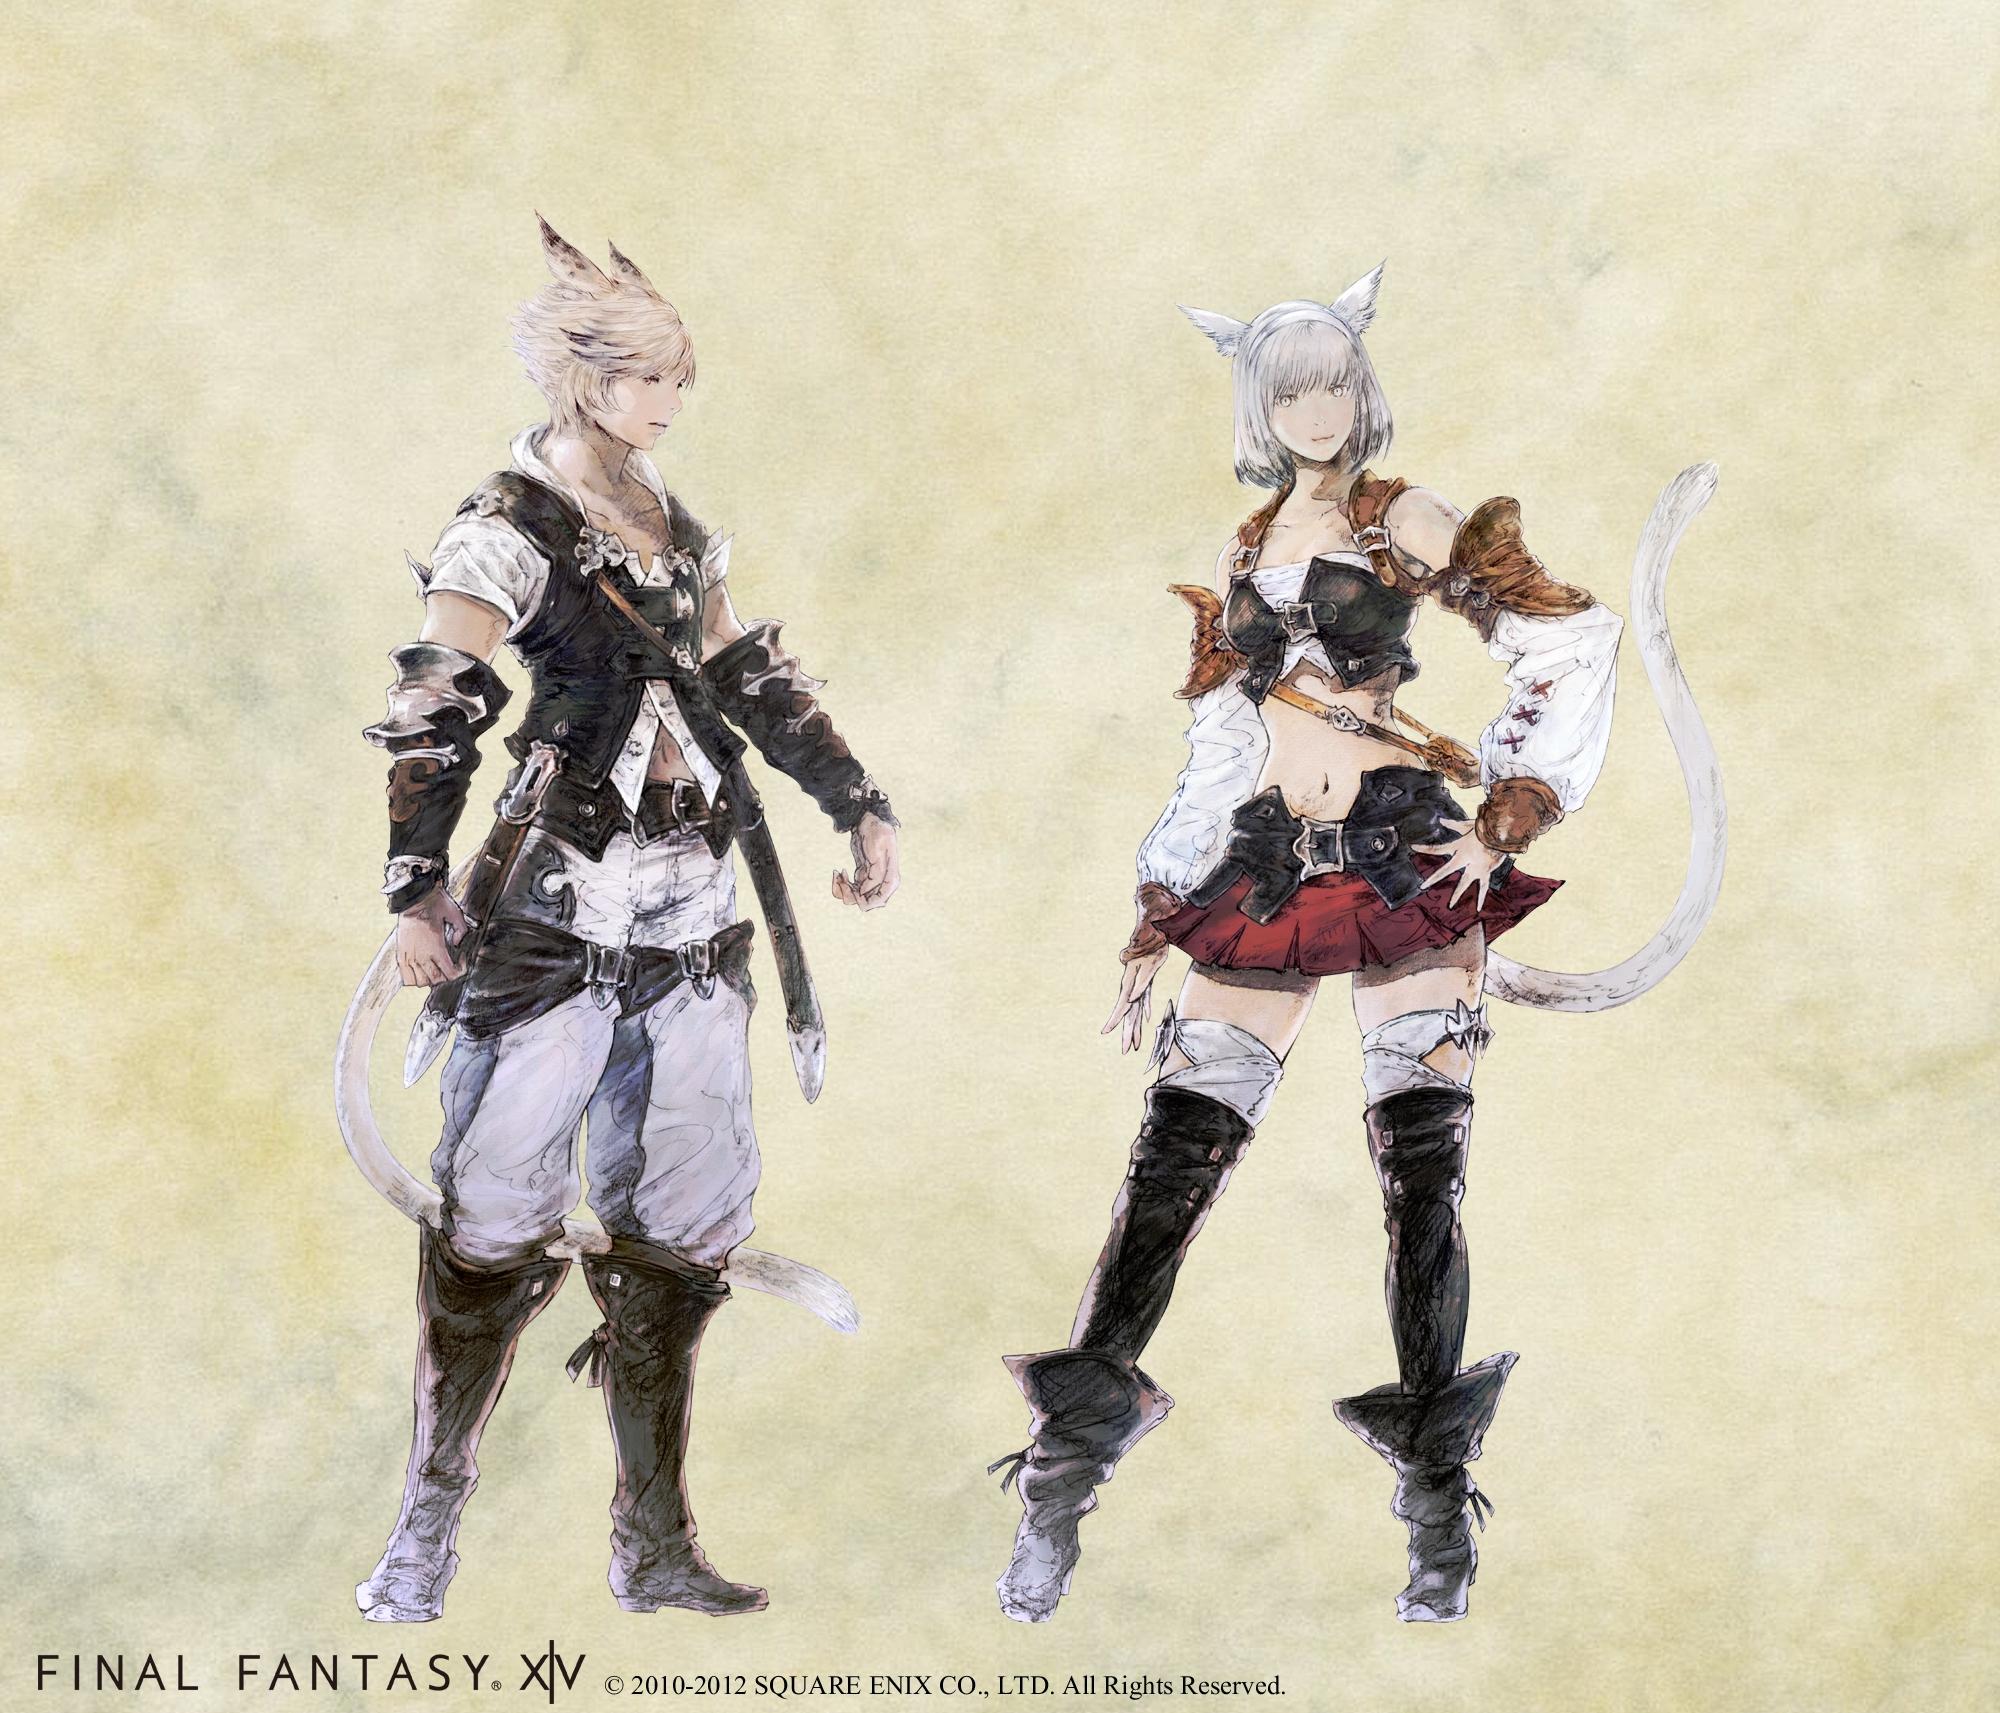 Final Fantasy XIV - Zerochan Anime Image Board